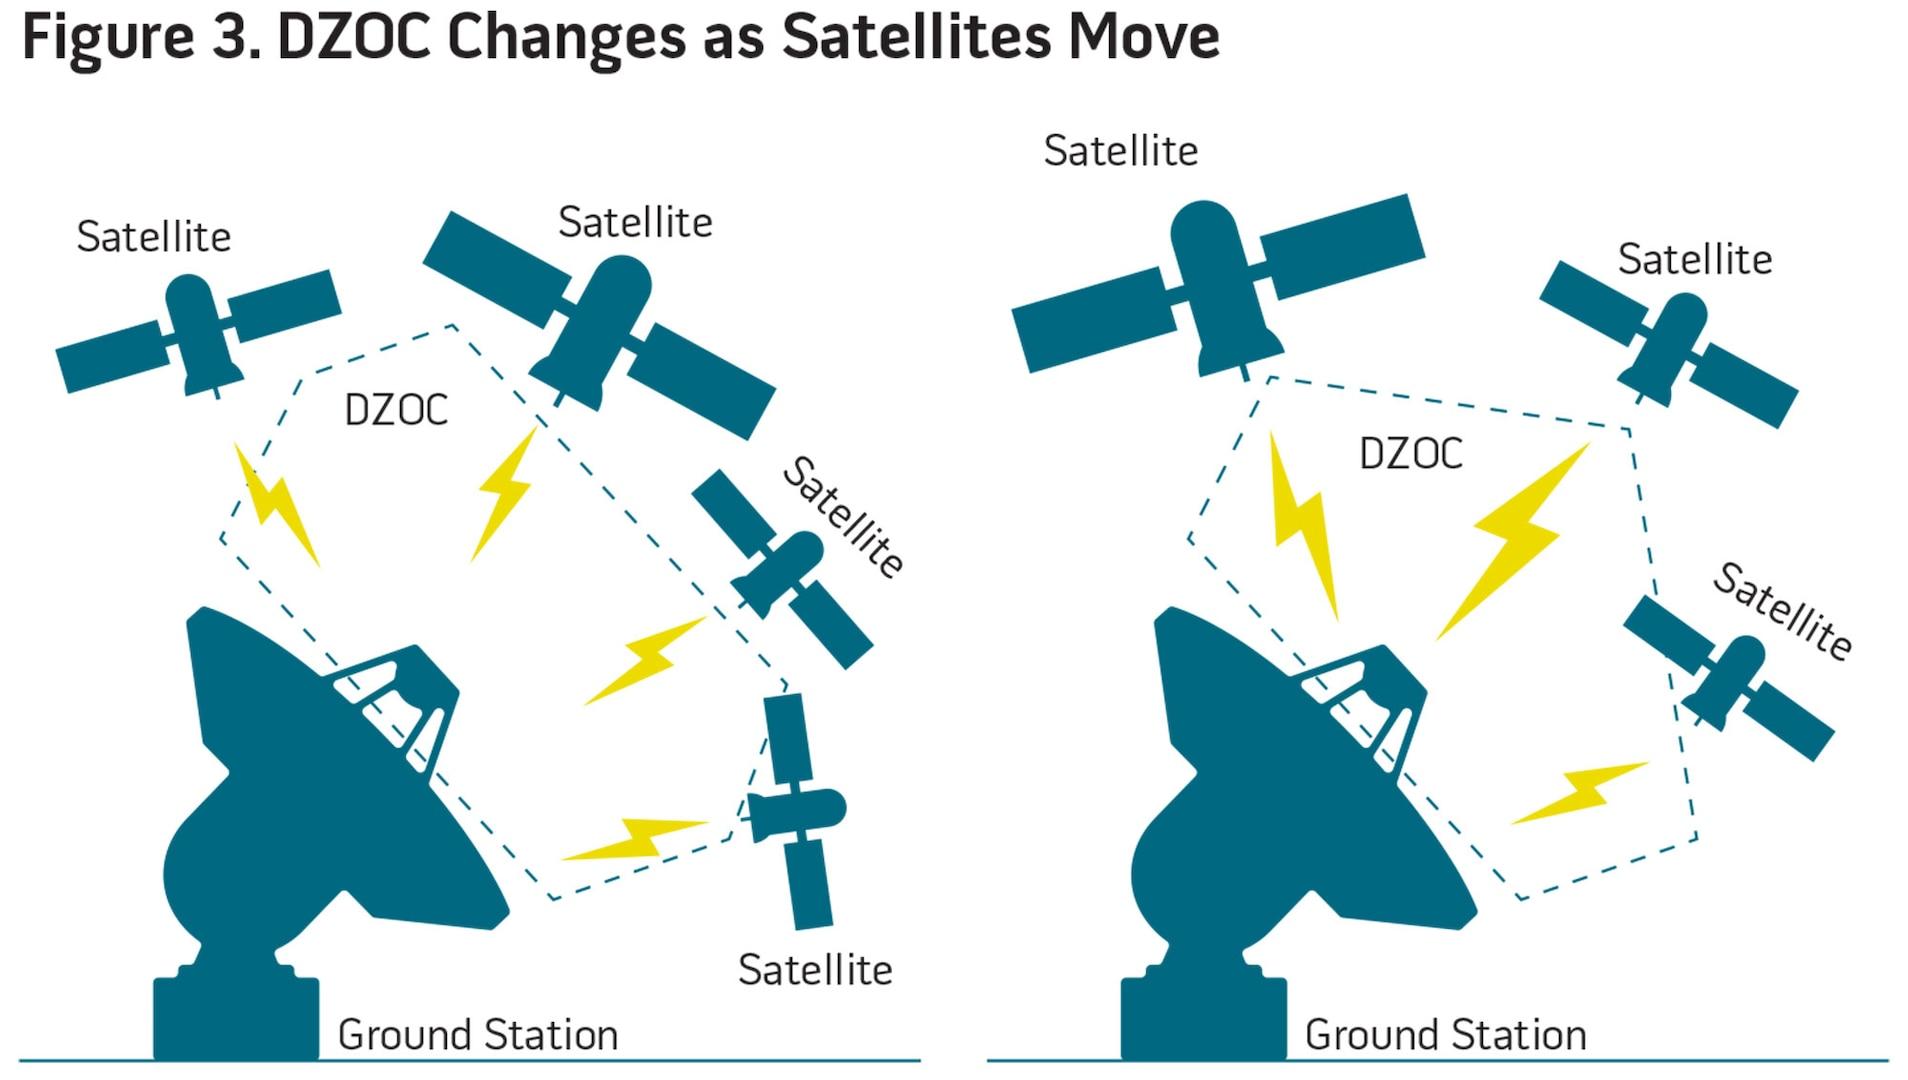 Figure 3. DZOC Changes as Satellites Move